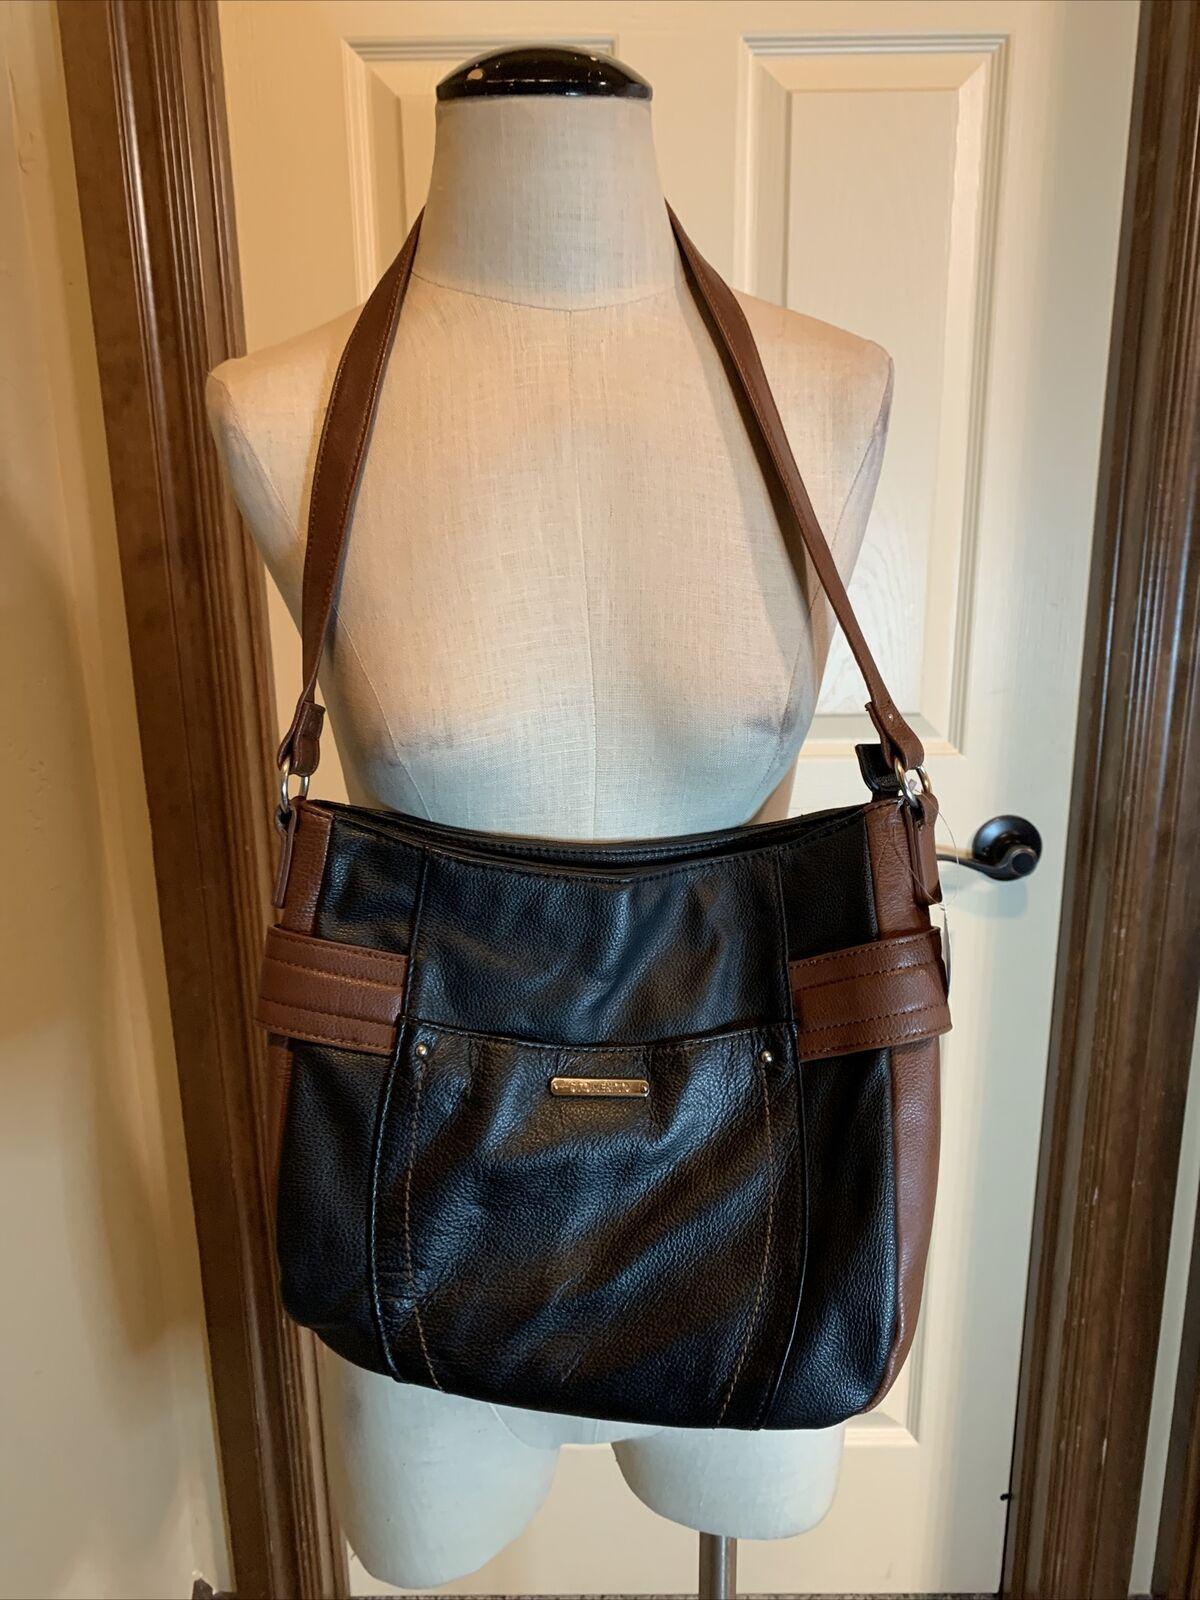 Stone & Co purse Handbag Hobo Black Brown NWT (159)